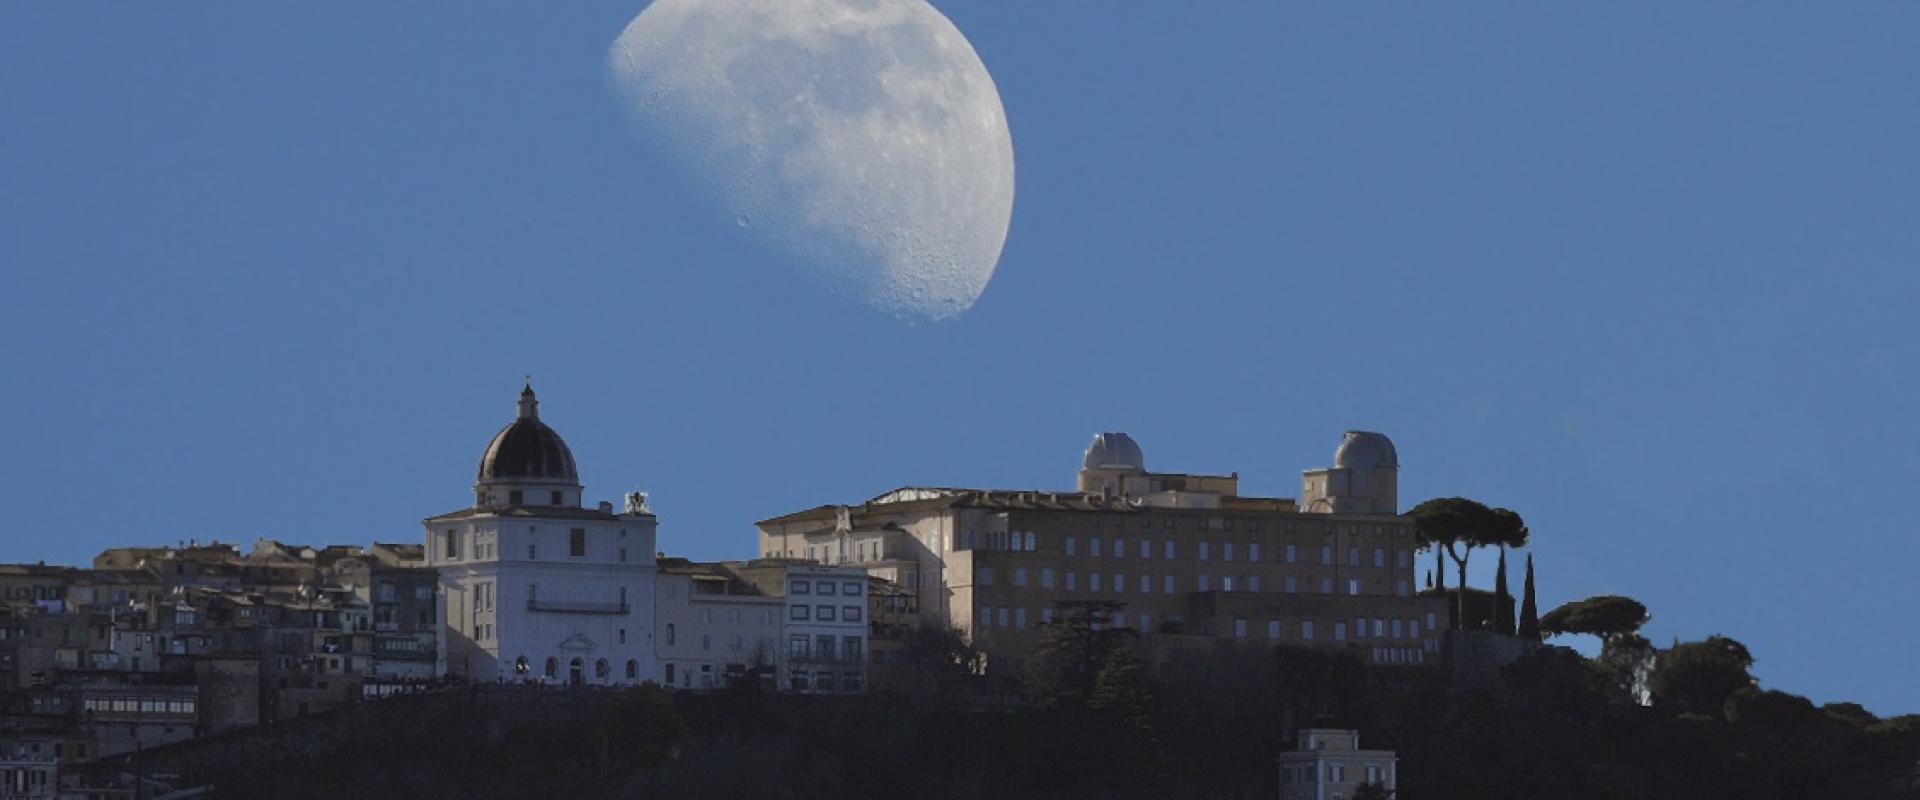 Castel Candolfo